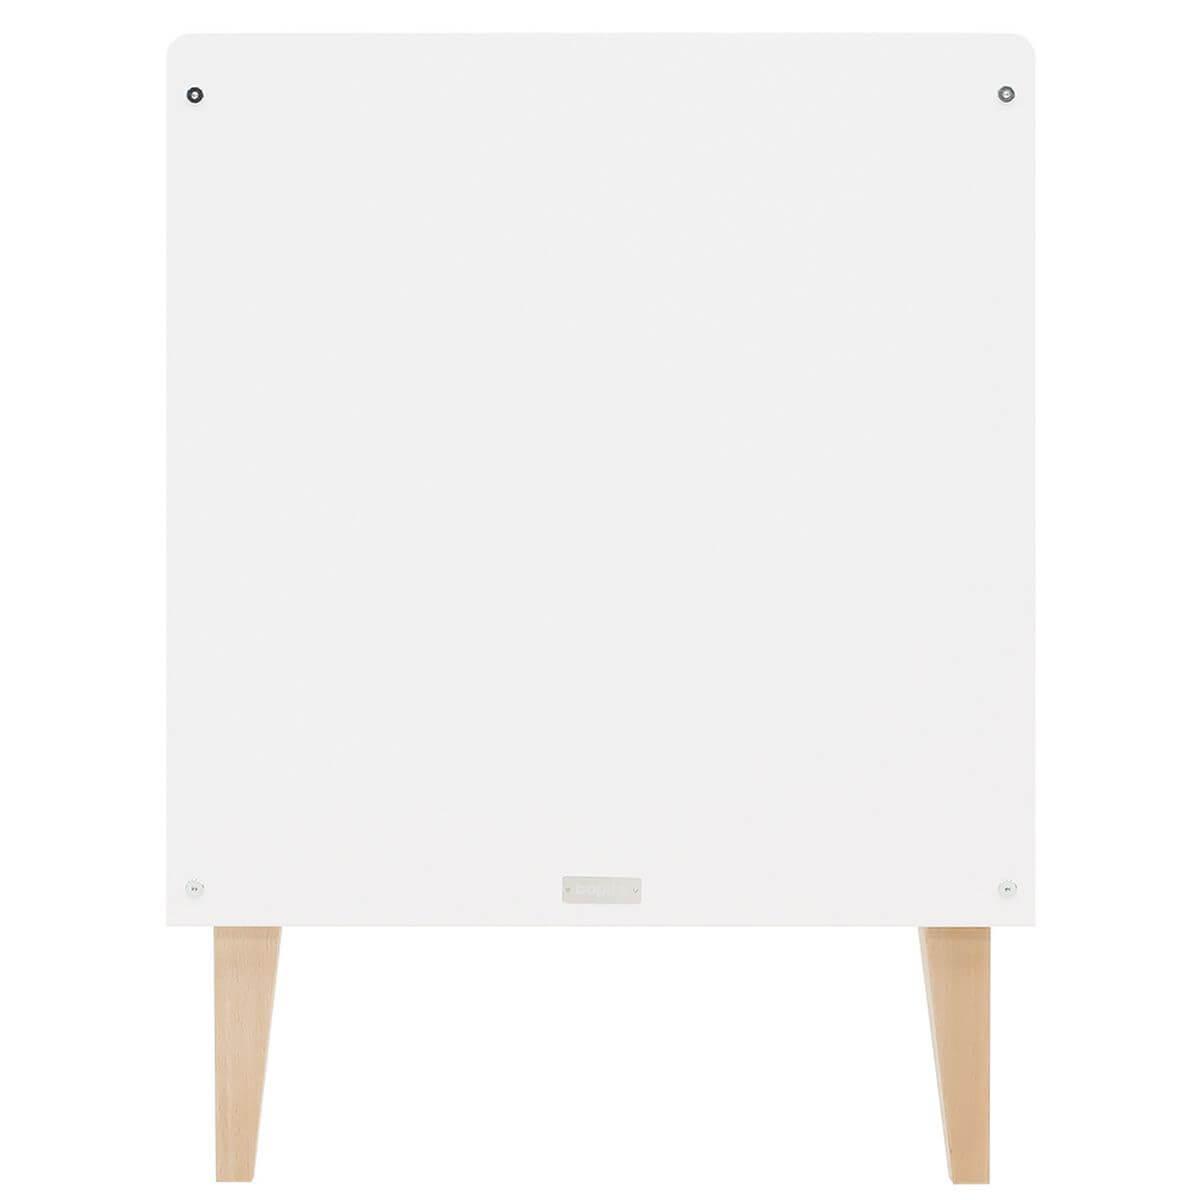 Lit 60x120cm INDY Bopita blanc-naturel